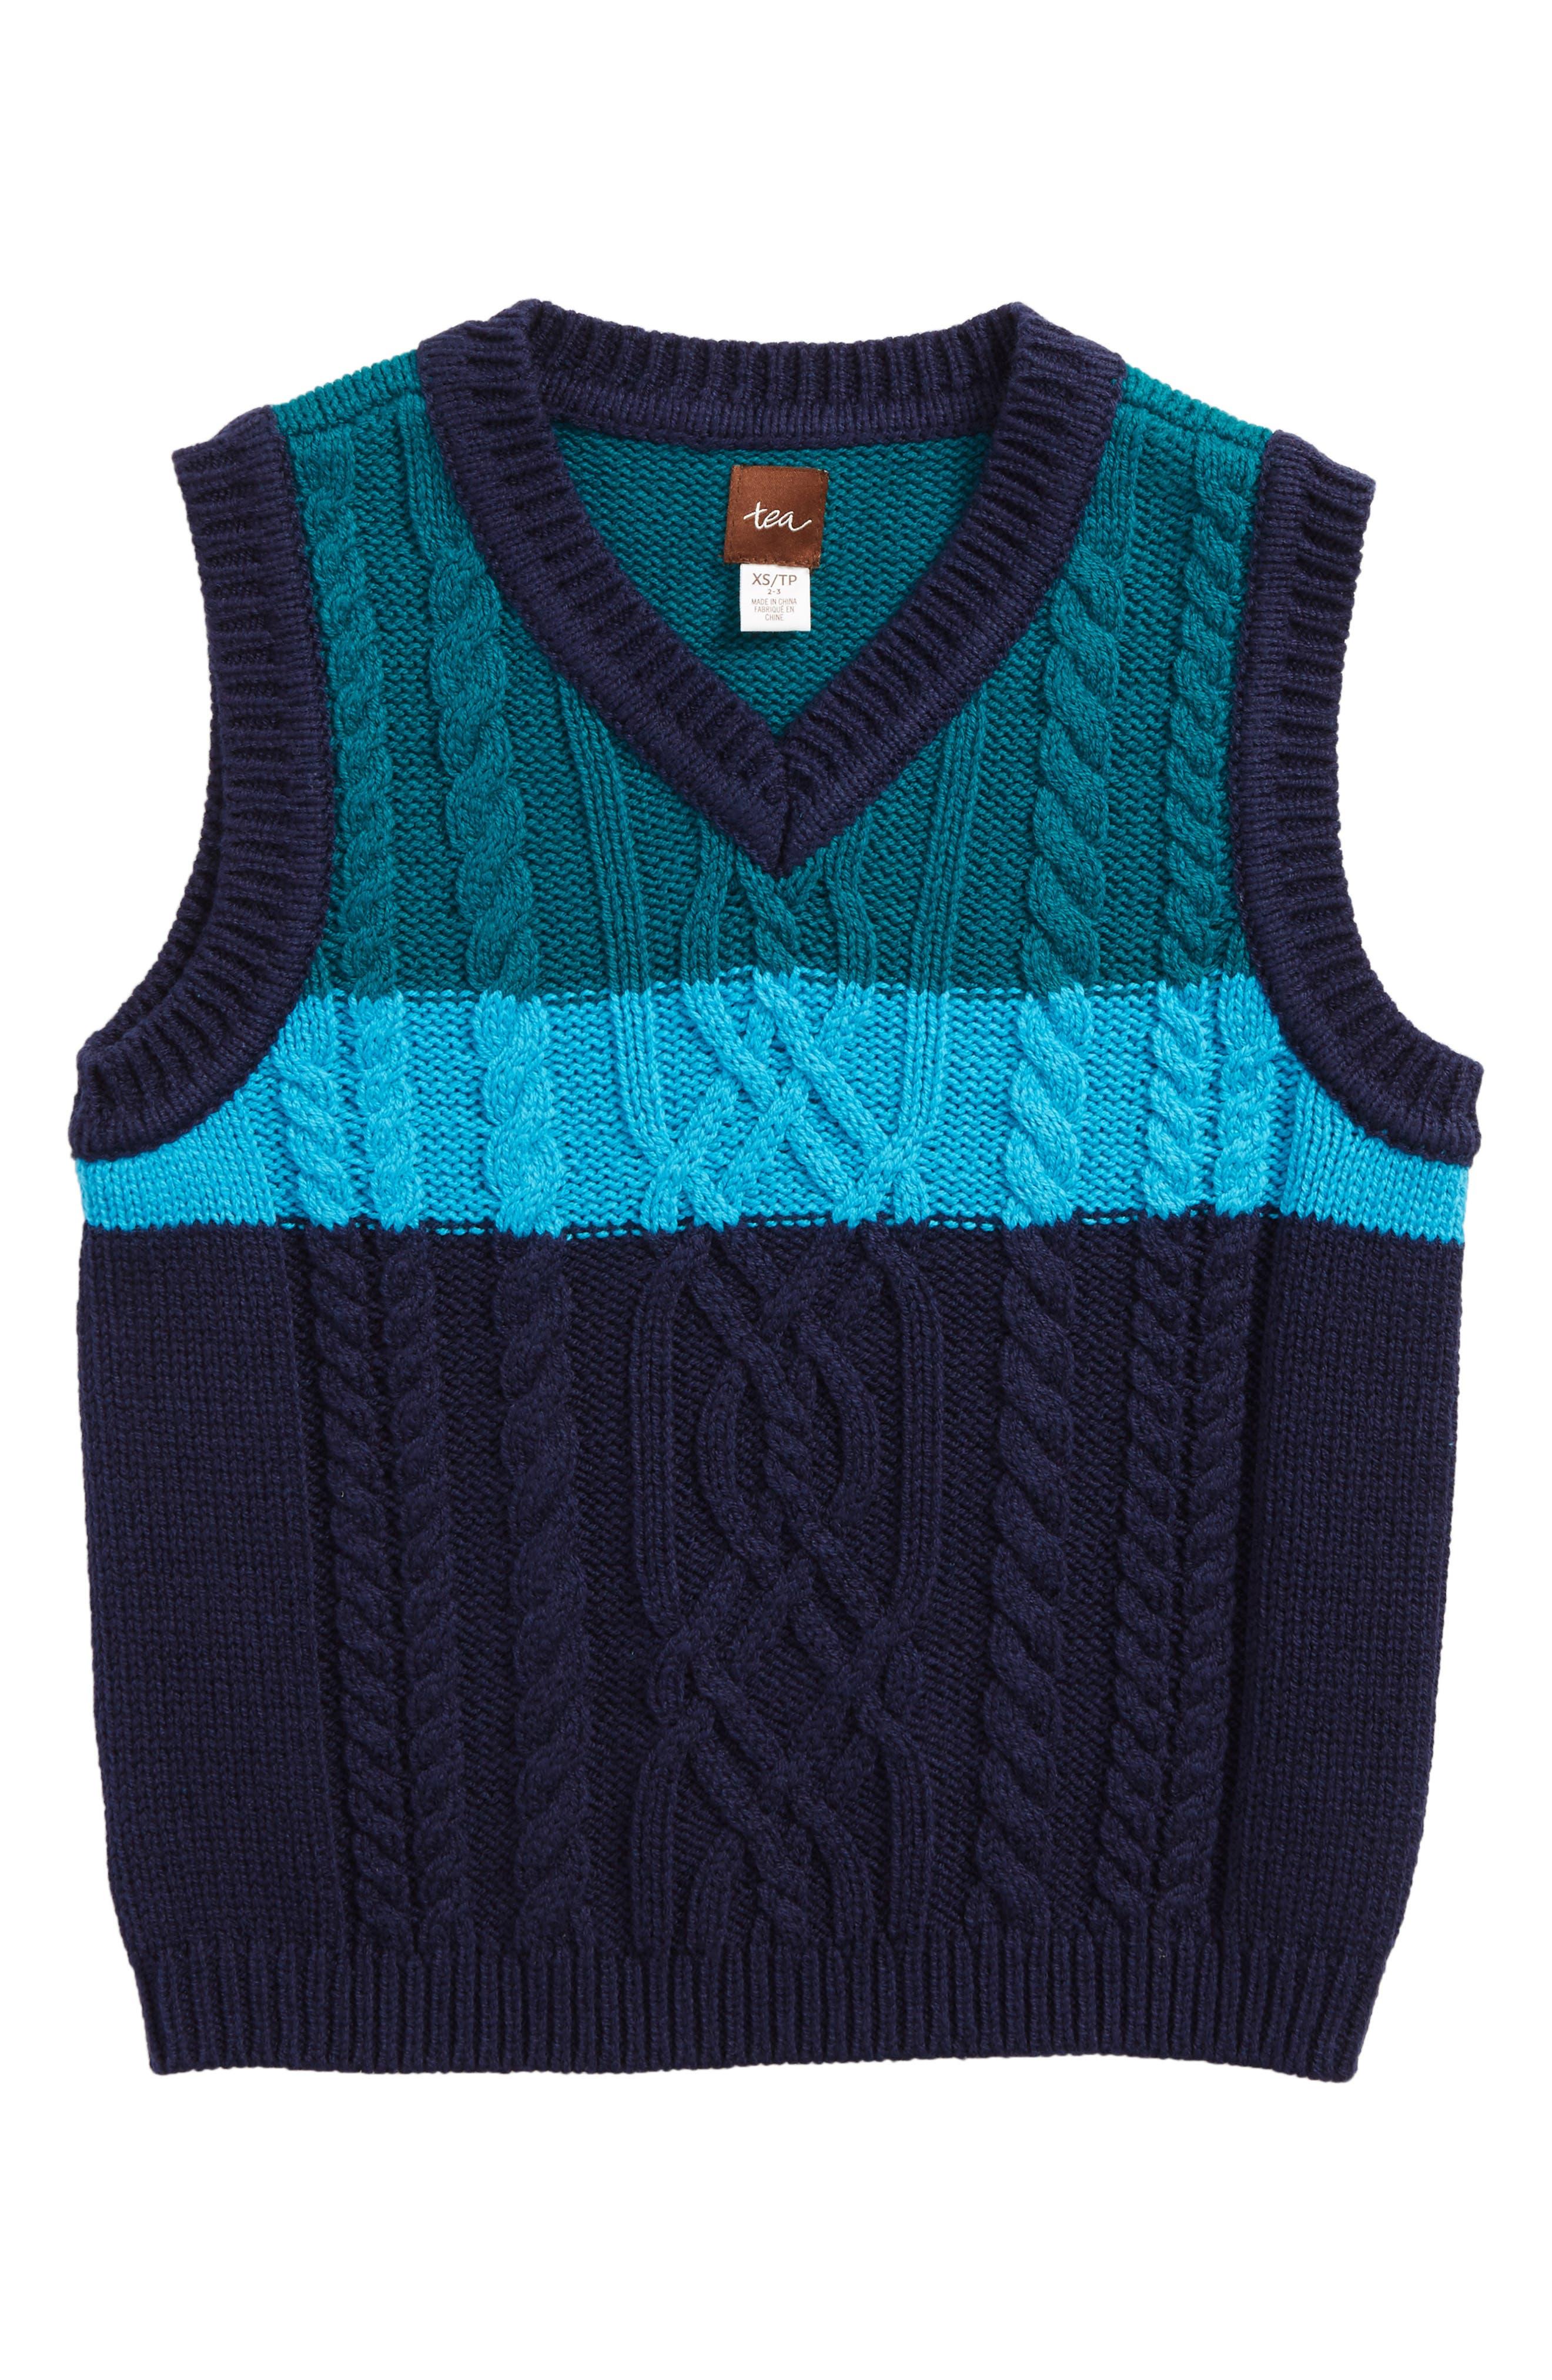 Edan Cable Knit Sweater Vest,                         Main,                         color, Beluga